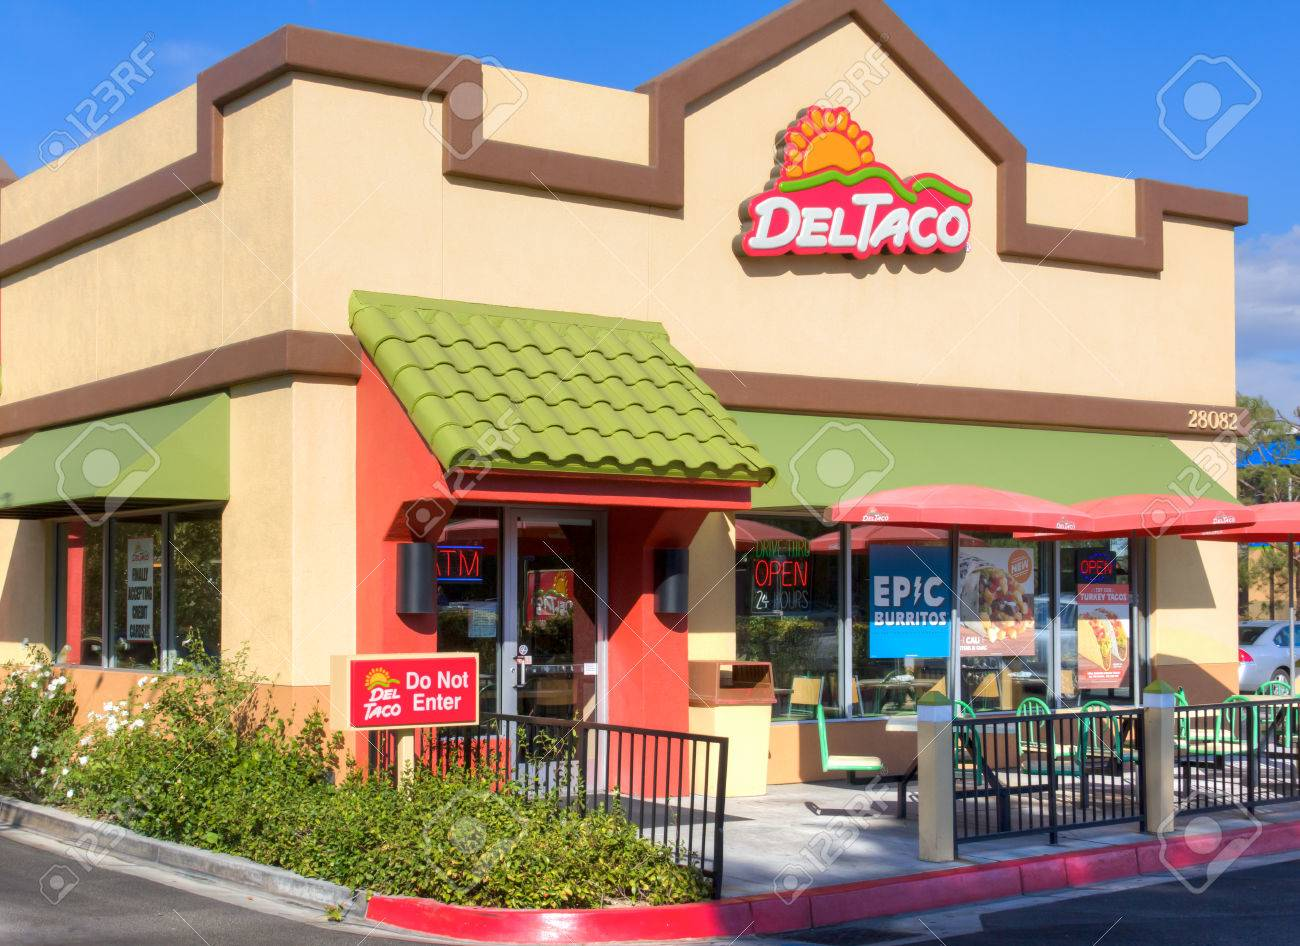 Santa Clarita Ca Usa August 20 2014 Del Taco Restaurant Stock Photo Picture And Royalty Free Image Image 31082138